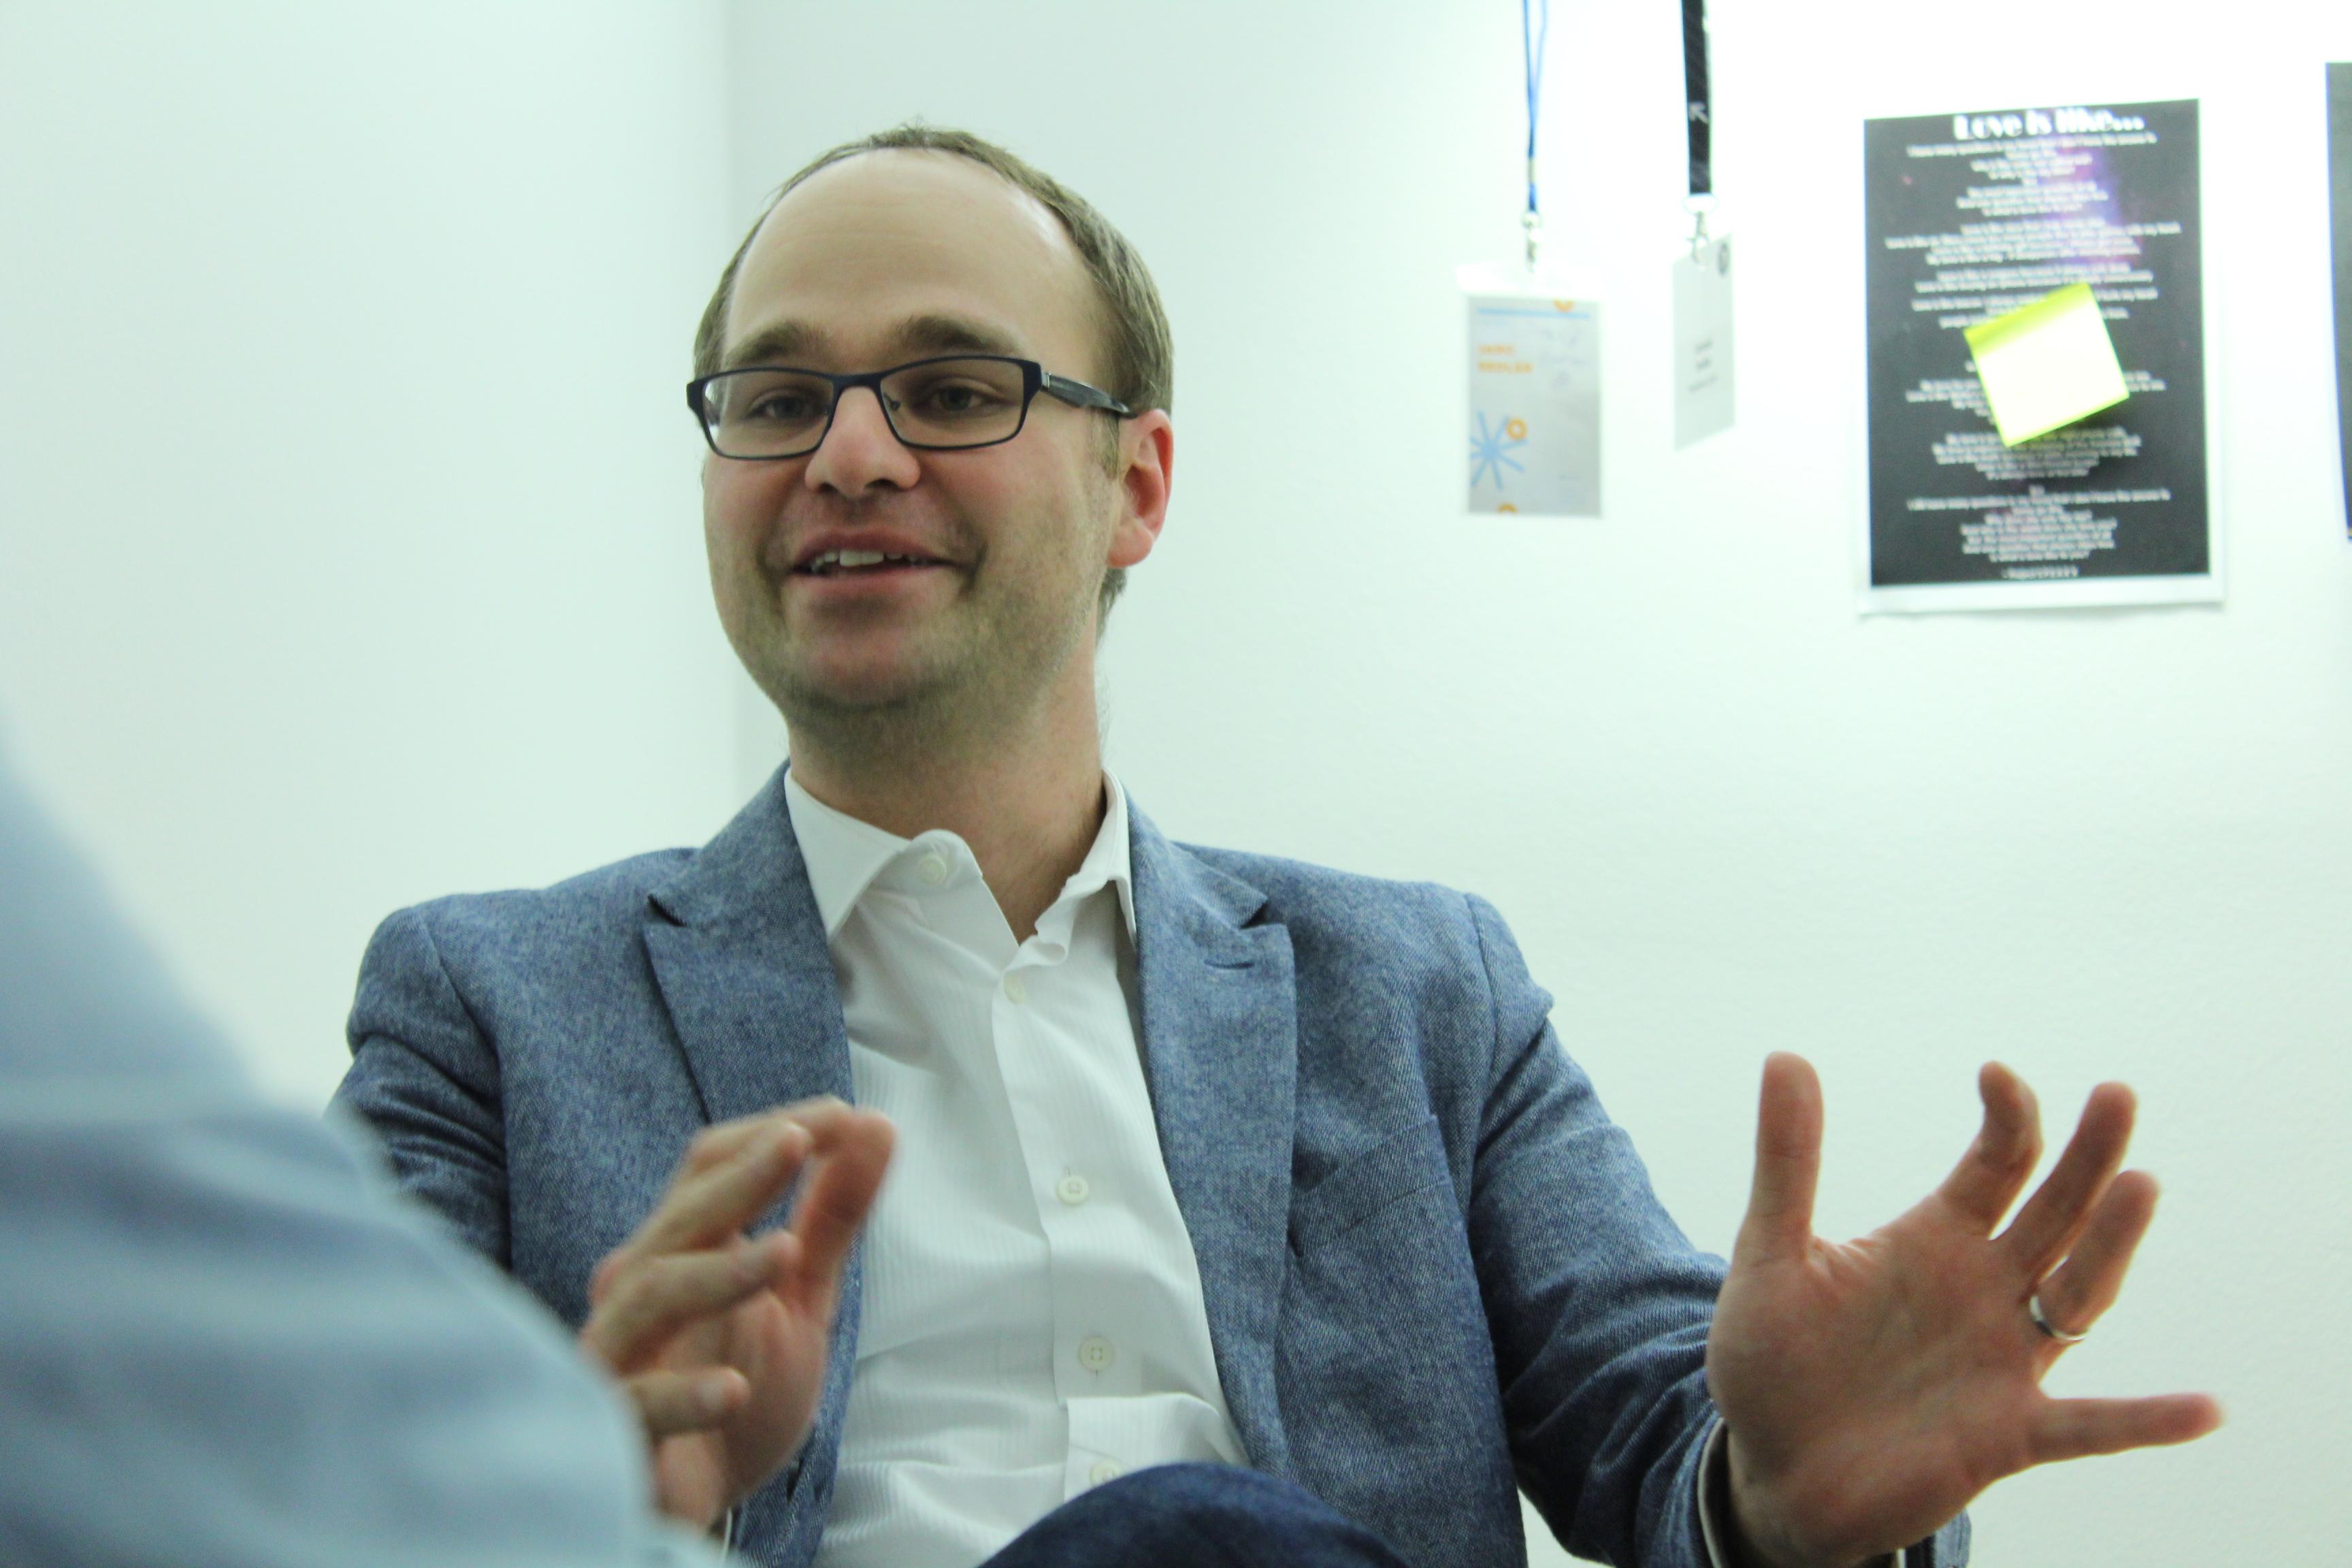 Interview with Jaromír Sedlár